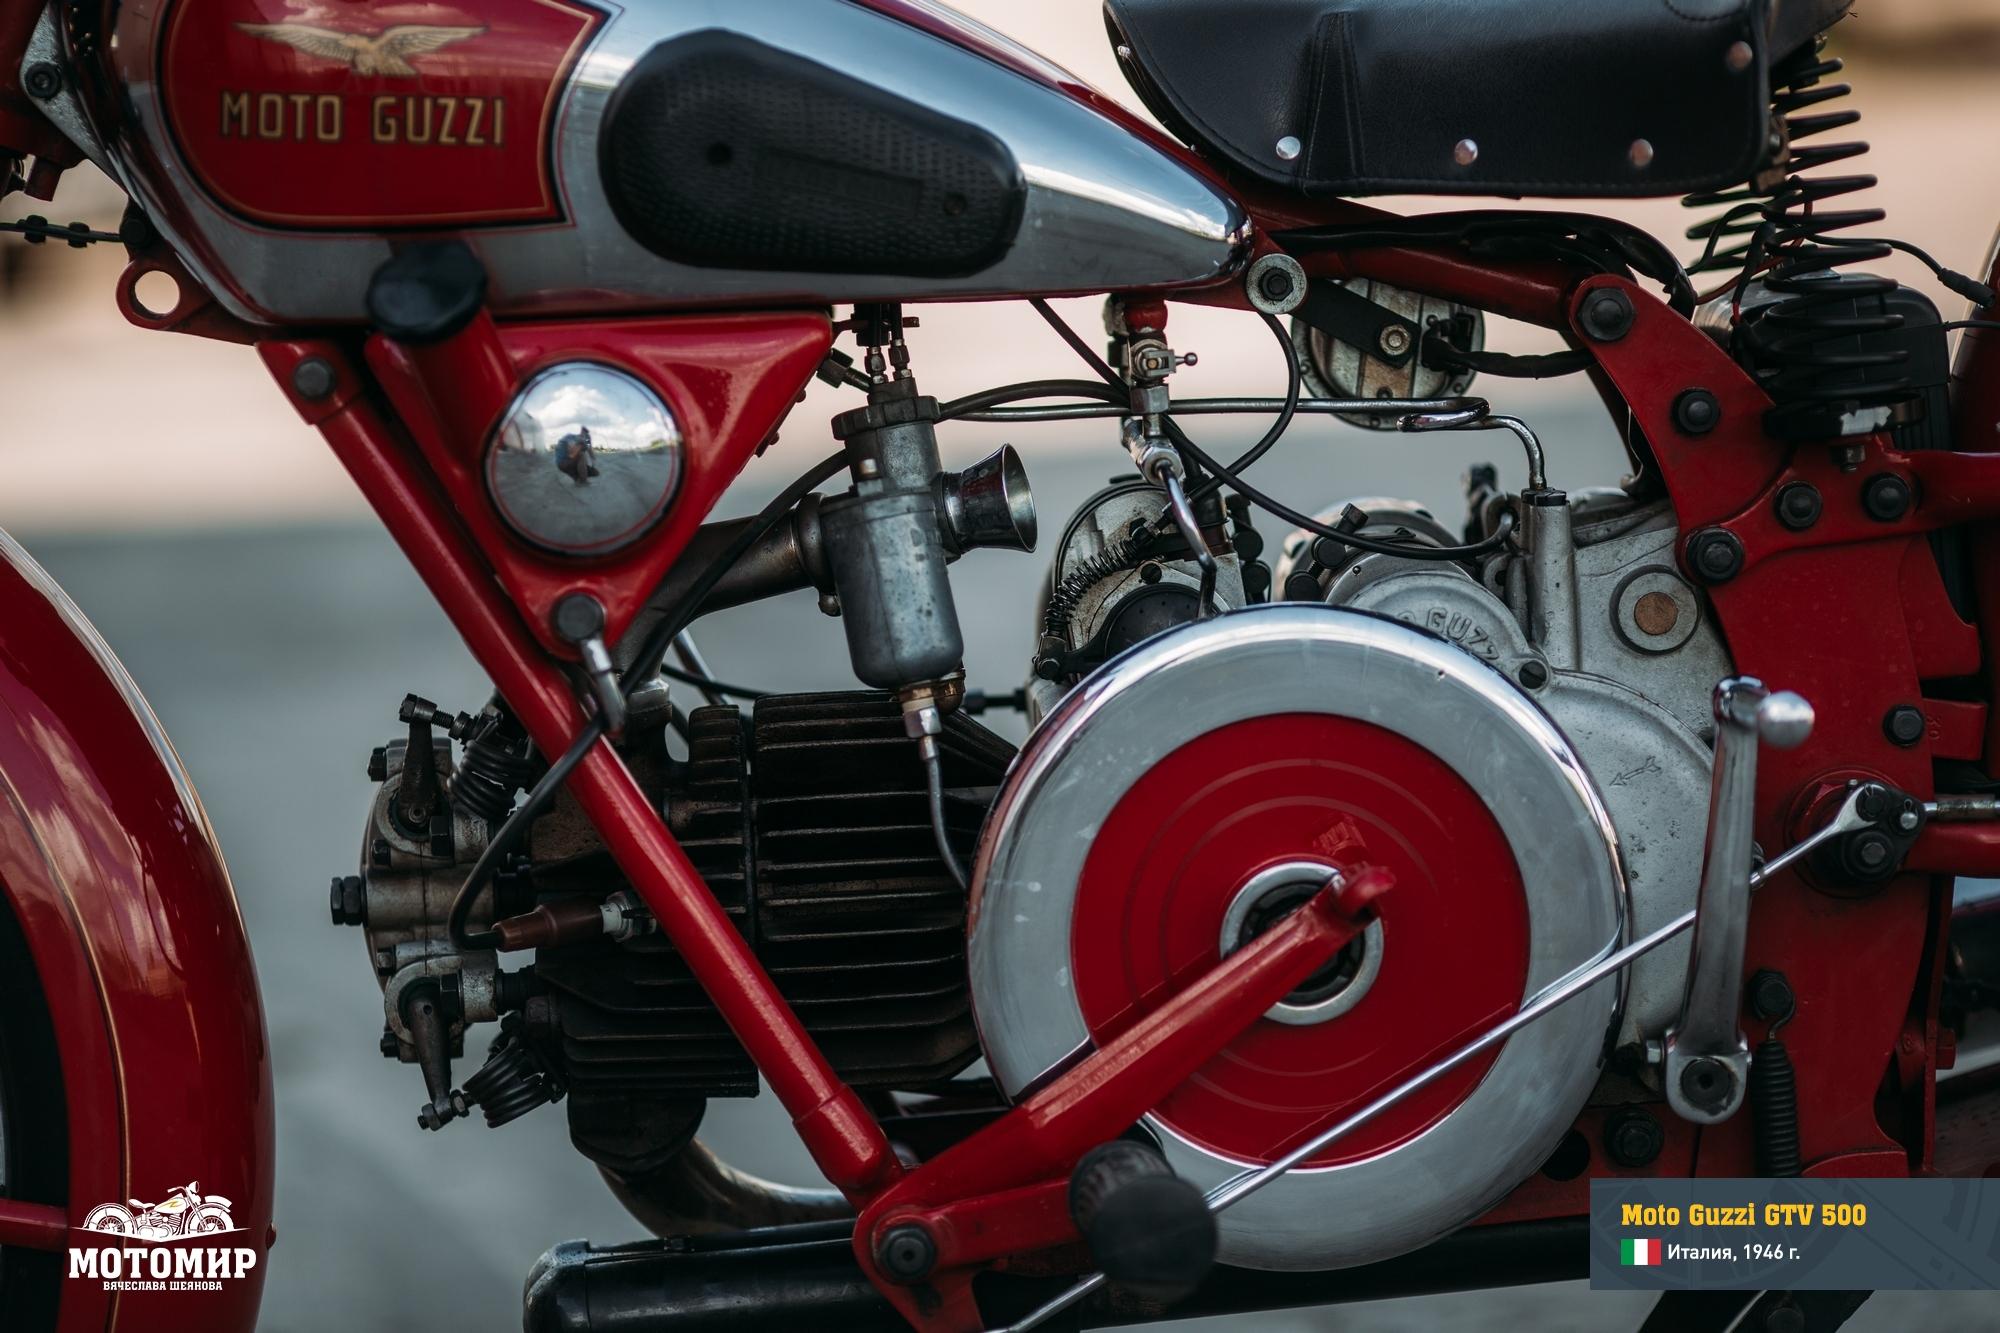 moto-guzzi-gtv-500-201509-web-14